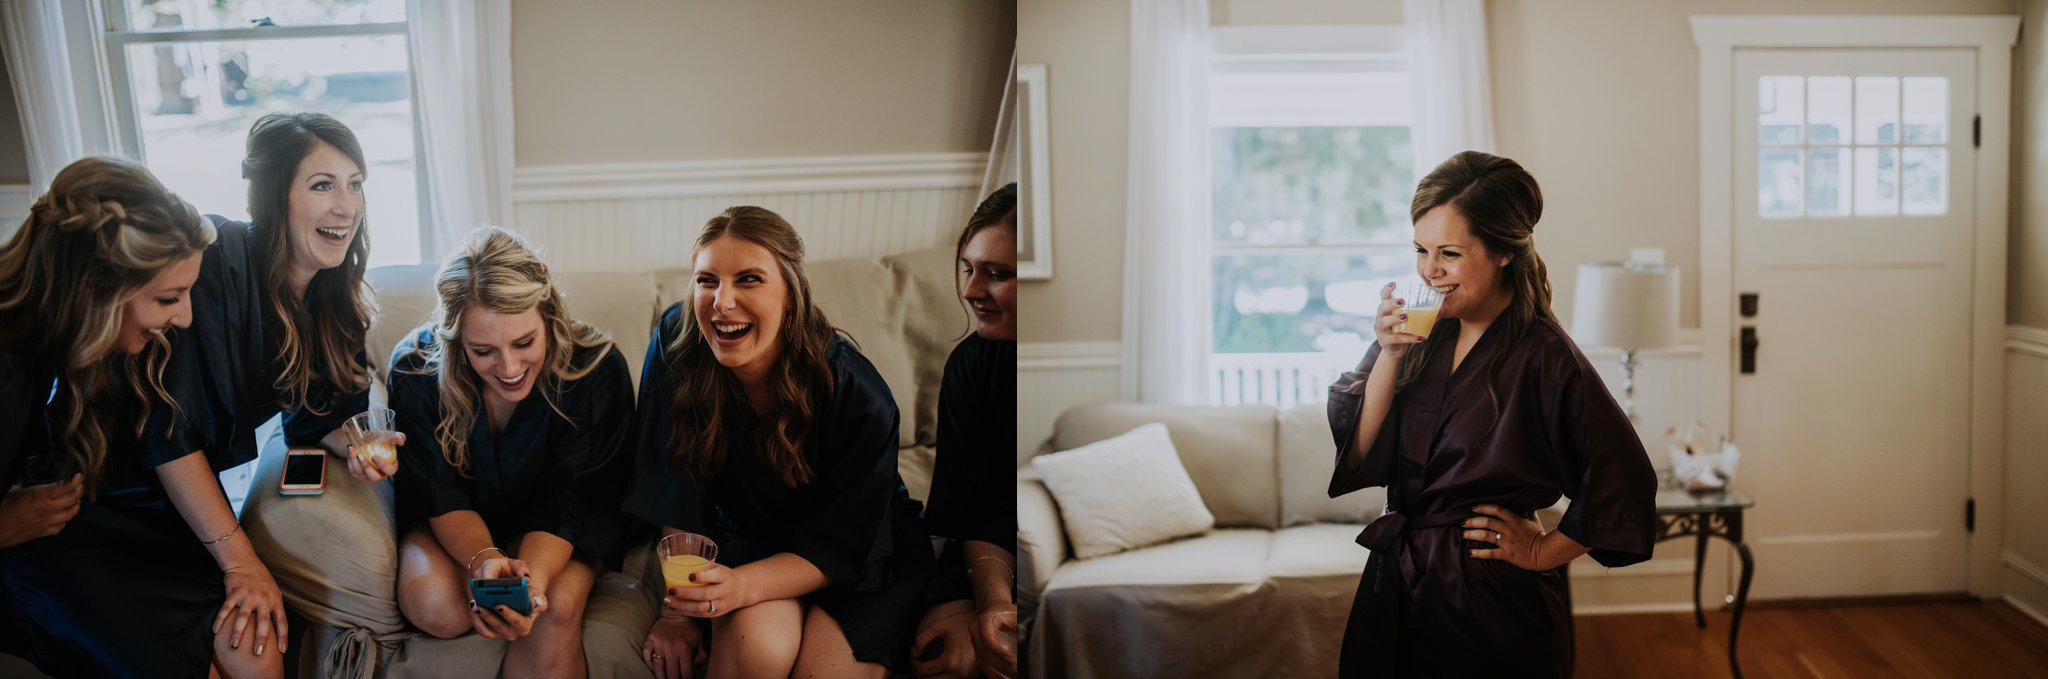 kristen-and-cody-the-kelley-farm-wedding-seattle-photographer-caitlyn-nikula-10.jpg